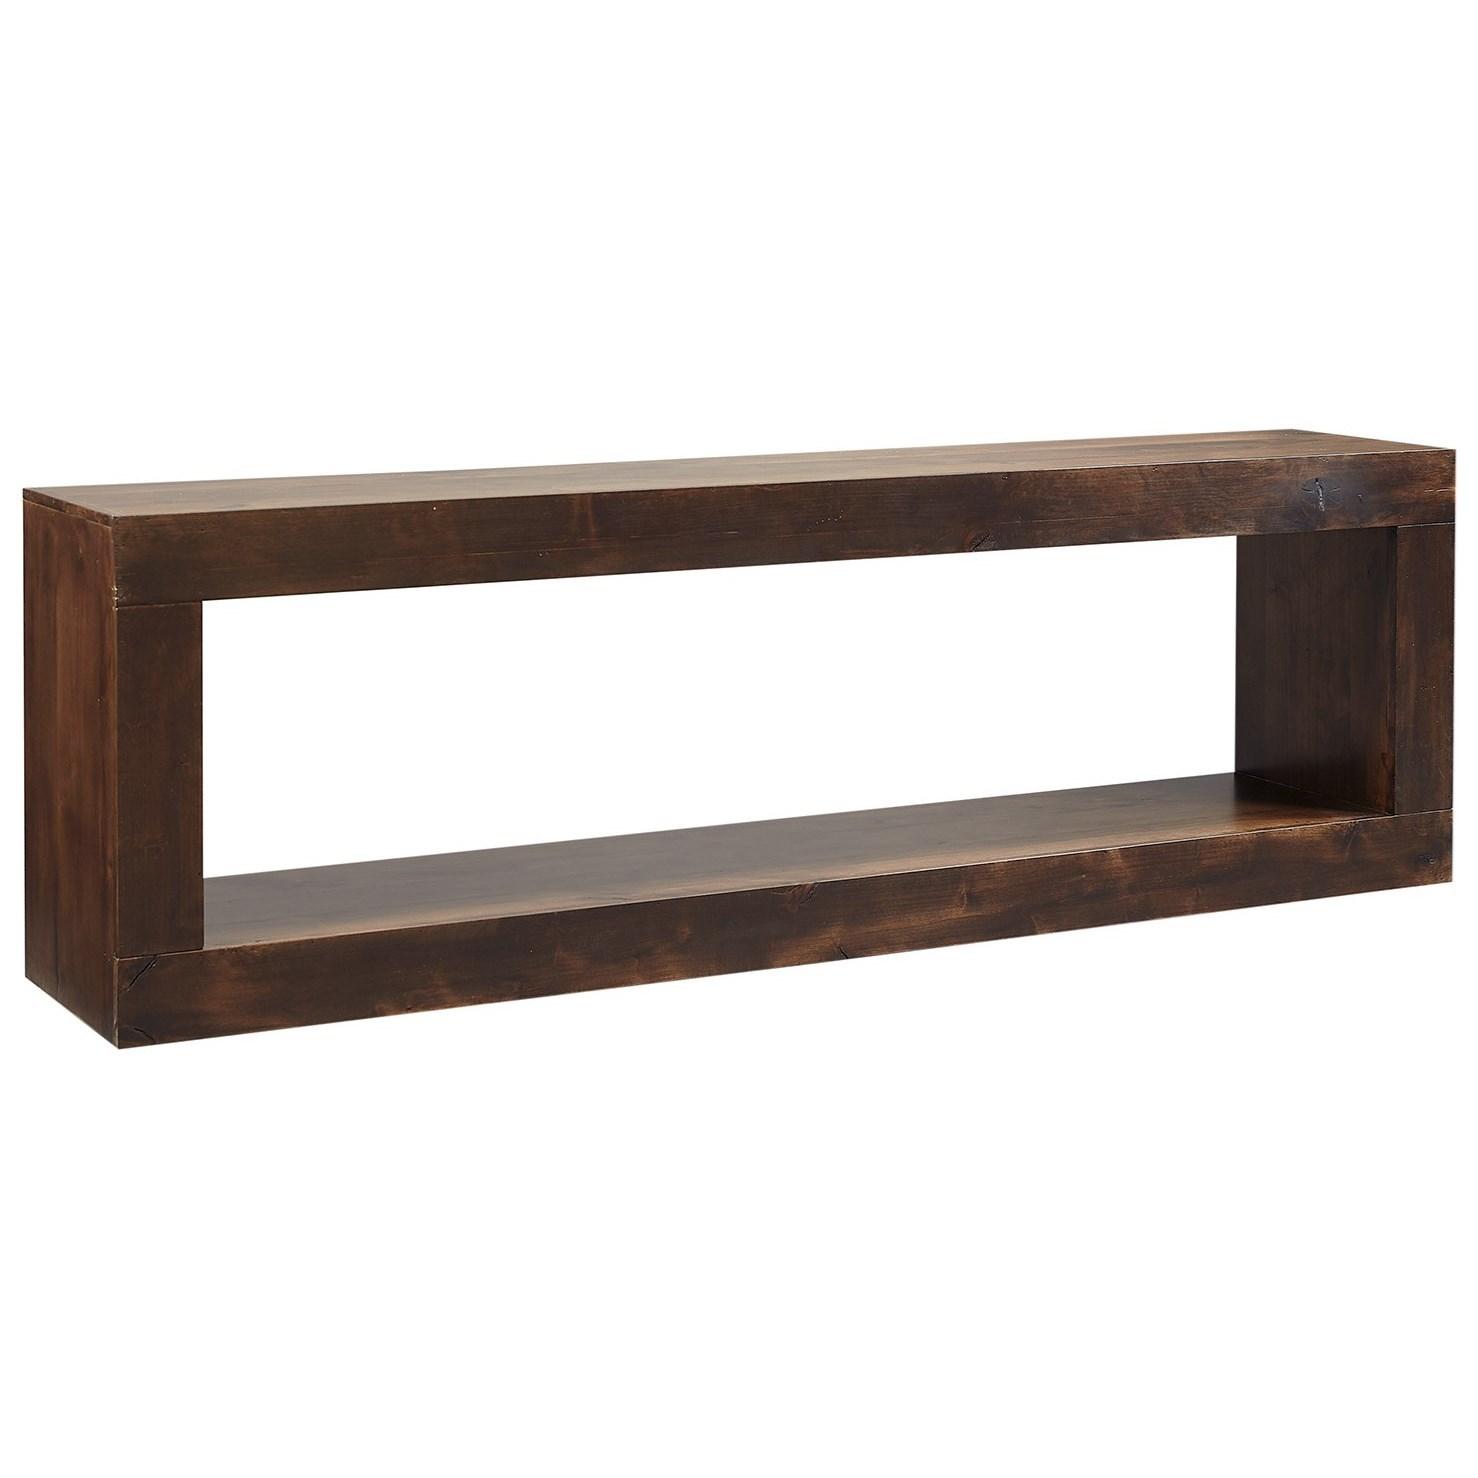 Nova Alder Open Console TV Stand by Aspenhome at Walker's Furniture